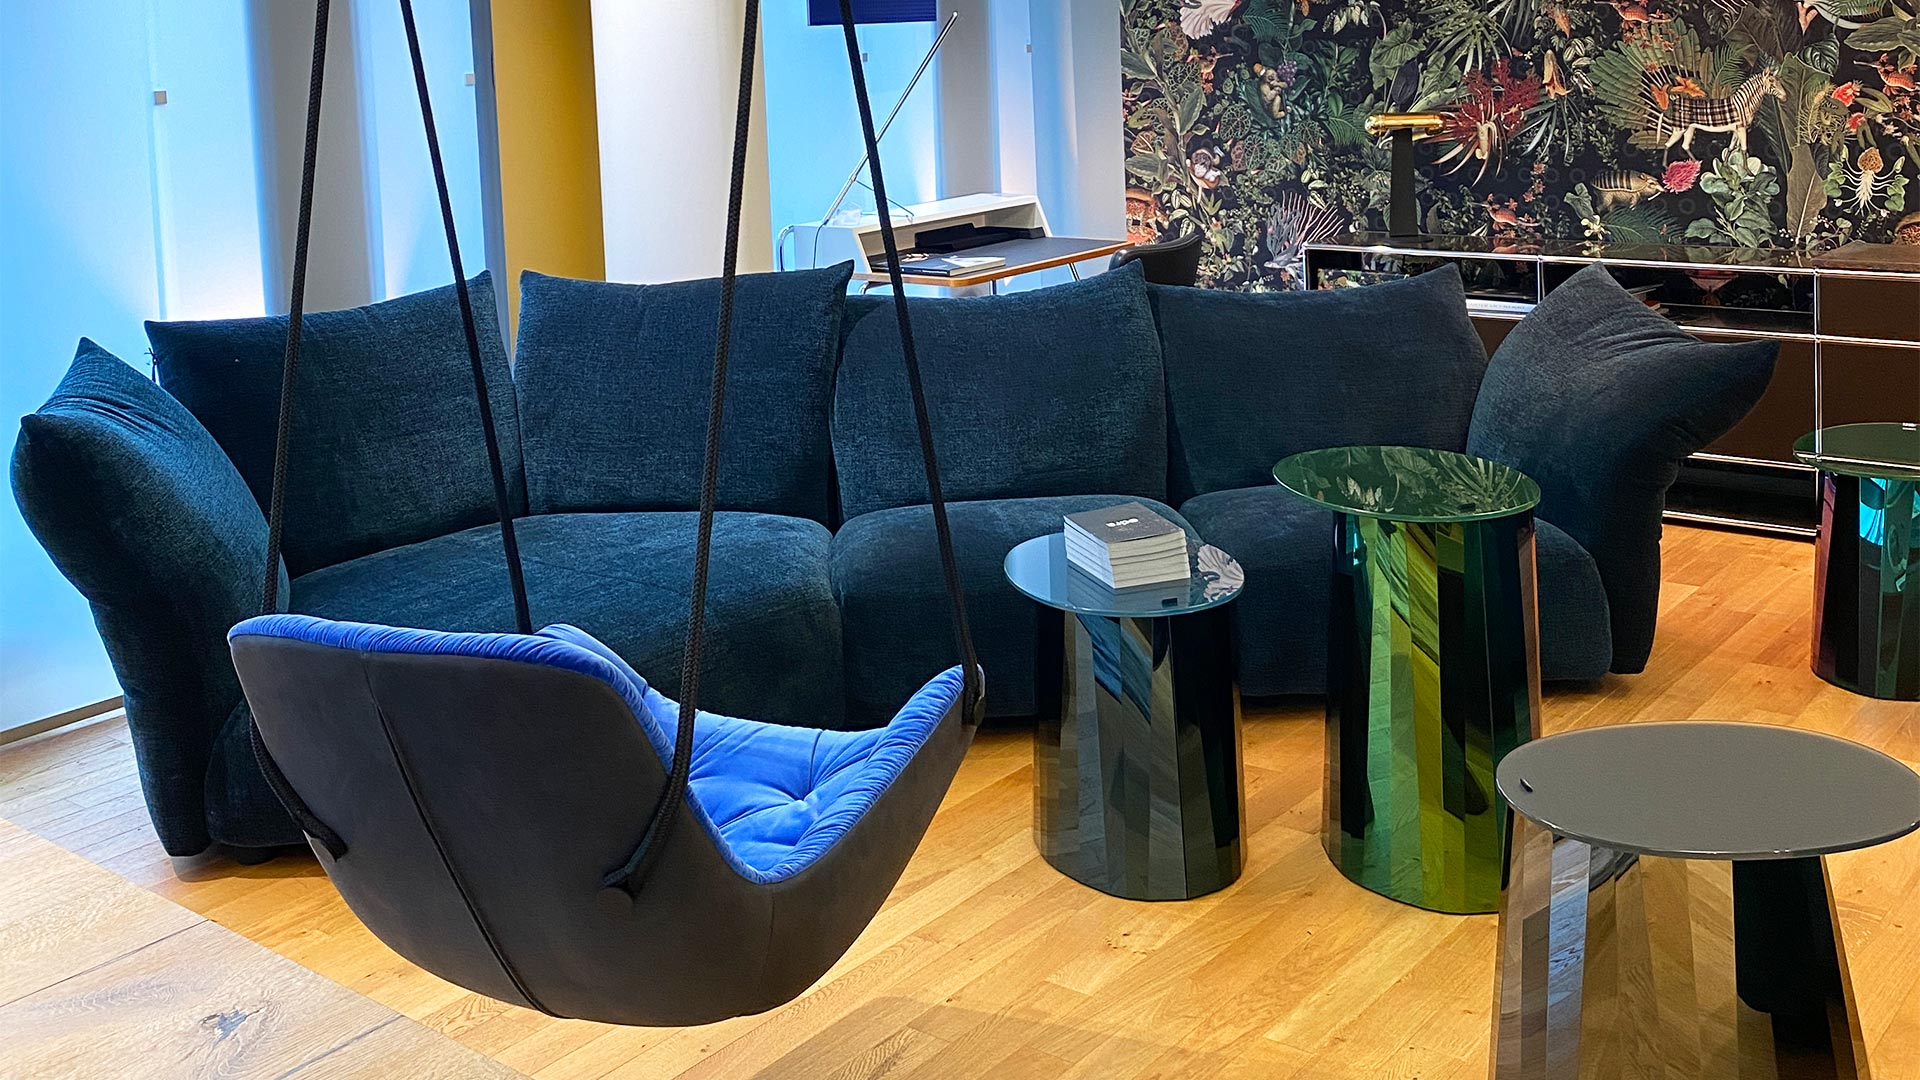 Edra Sofa + Freifrau Swingseat + Classicon Tische in Berlin bei steidten+